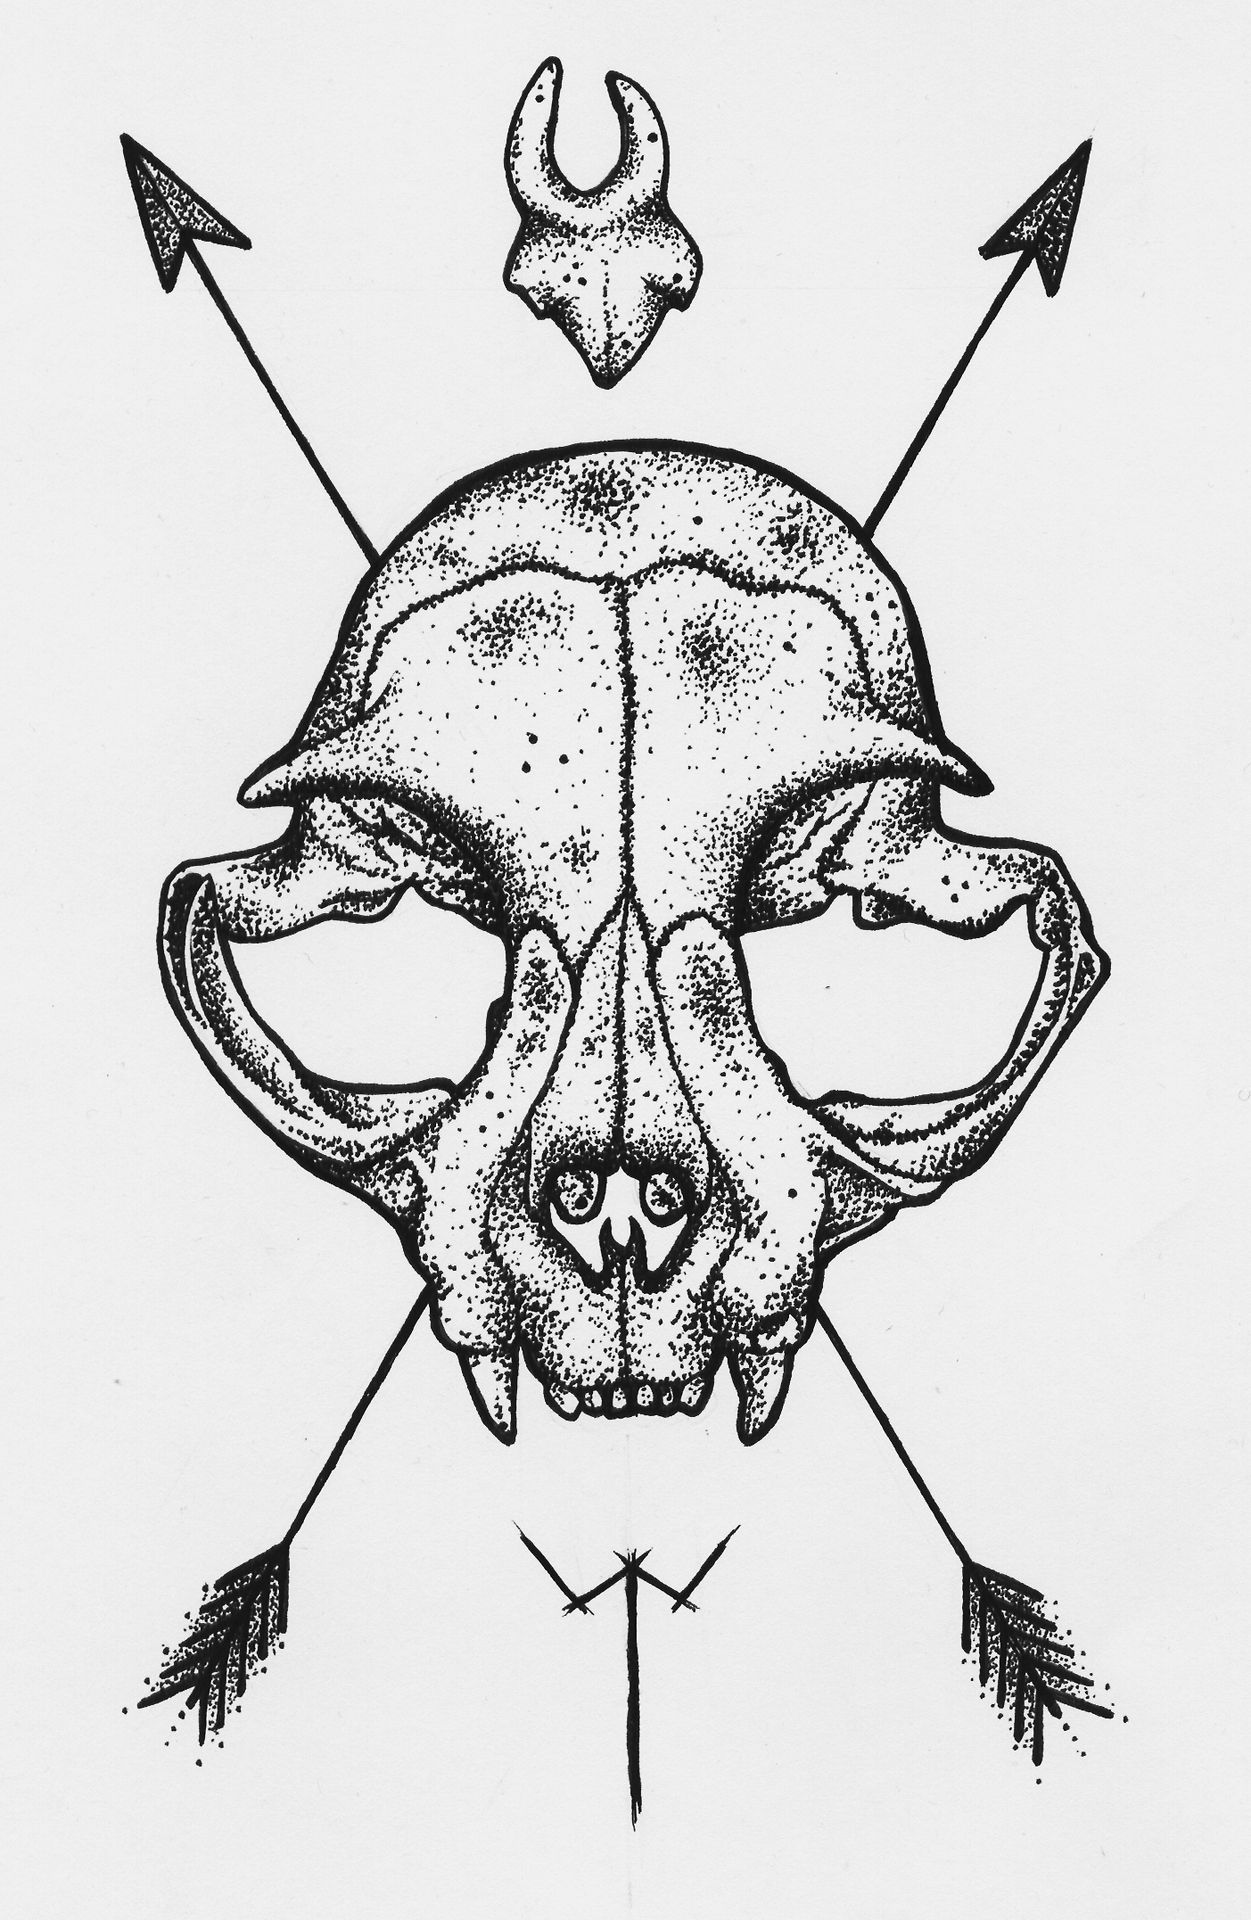 animal skull tattoo Tumblr Animal skull tattoos, Cat